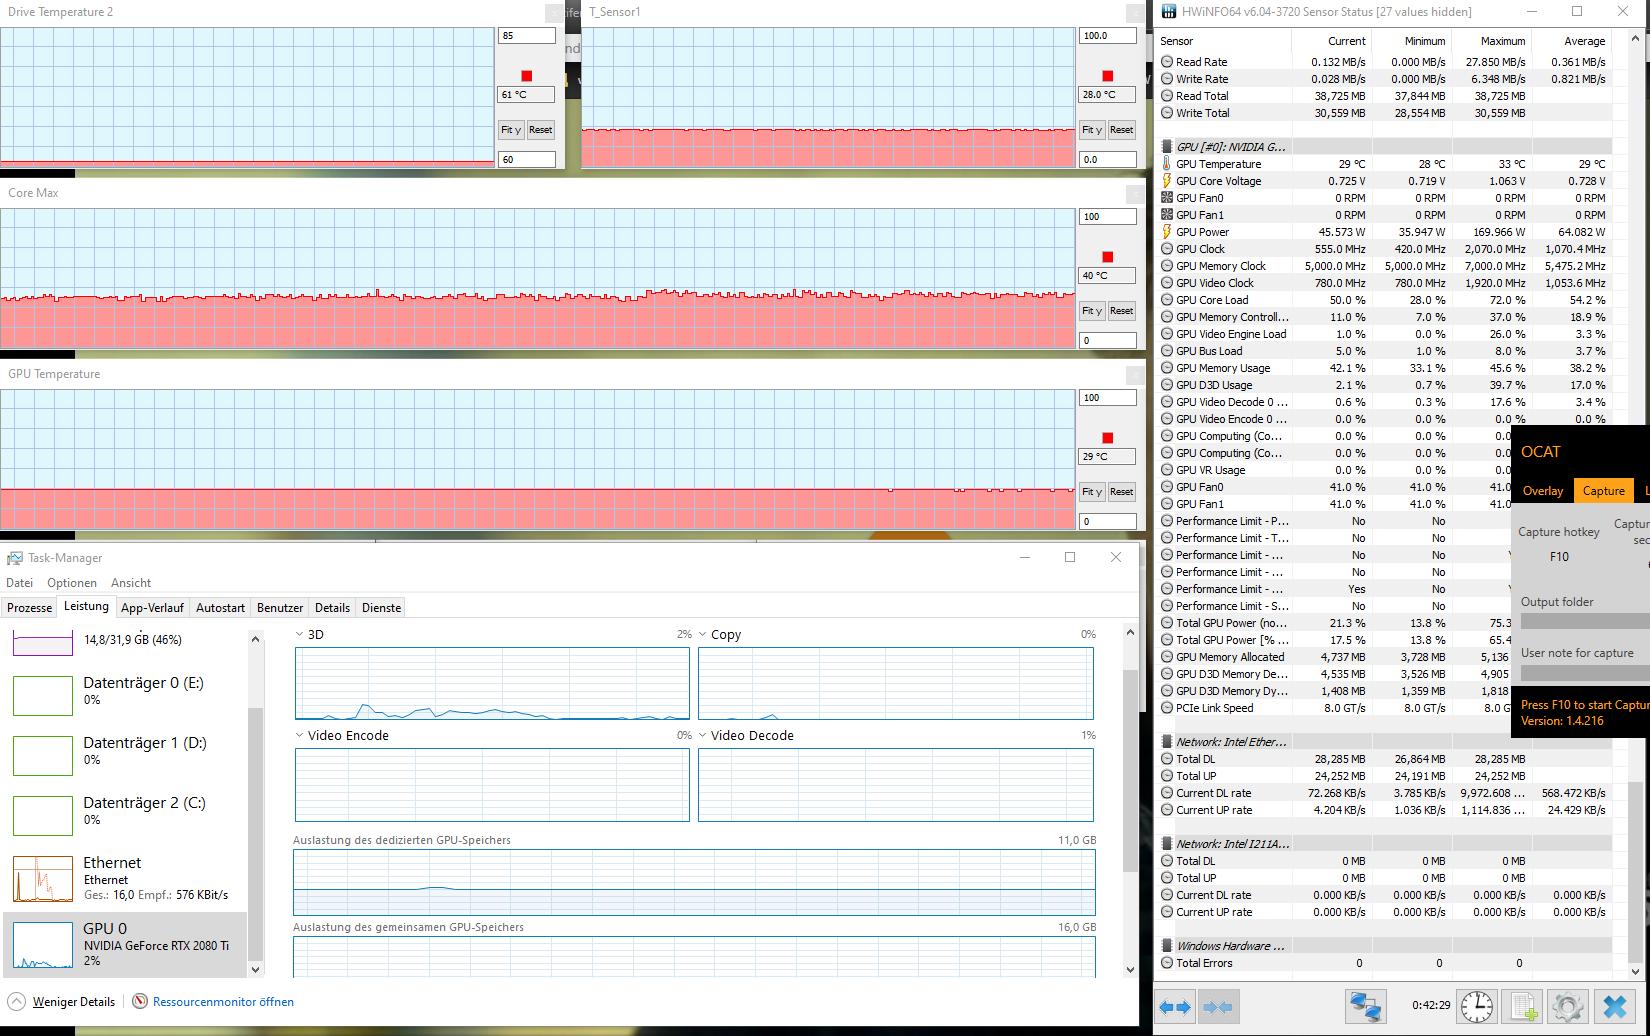 GPU drops to powersave/desktop clocks on Boss week · Issue #136